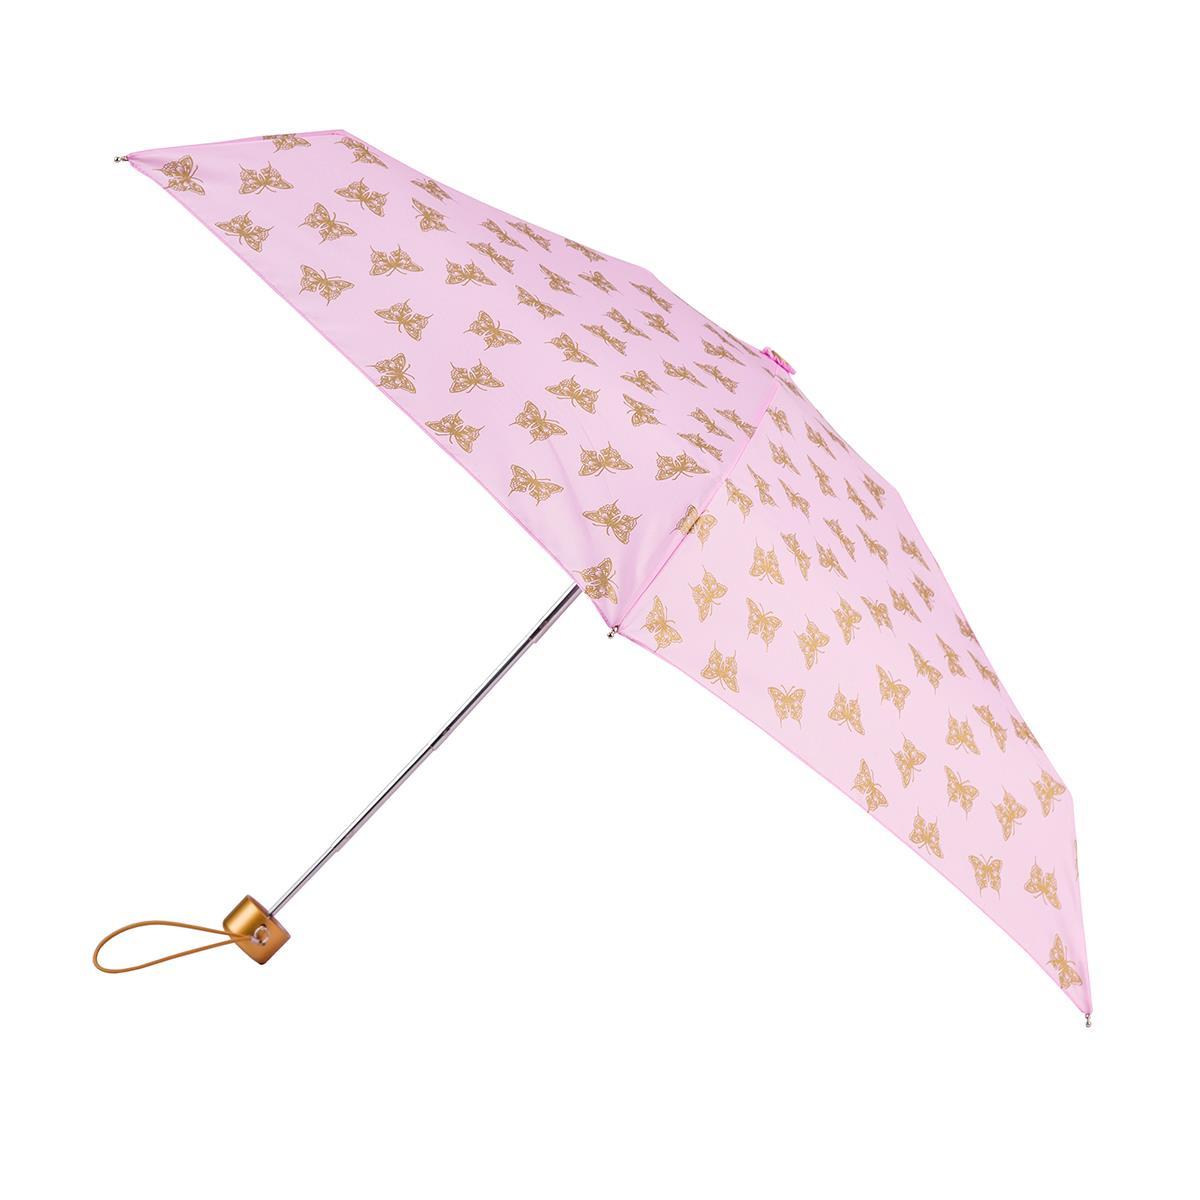 totes mini round metallic gold butterfly print umbrella 5 section